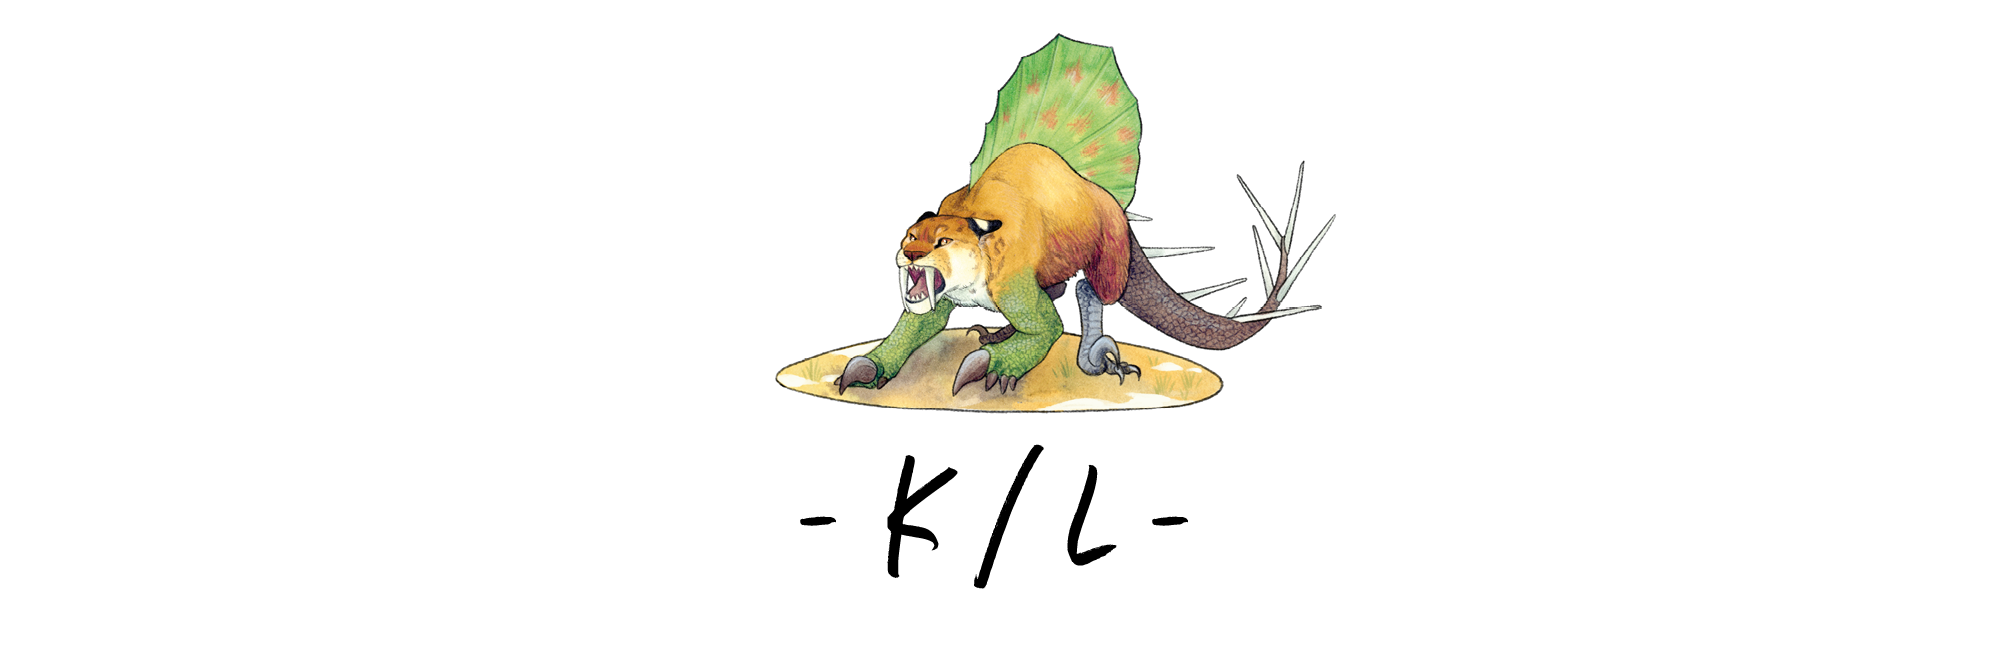 https://api.treecer.com/storage/83/K_L.png